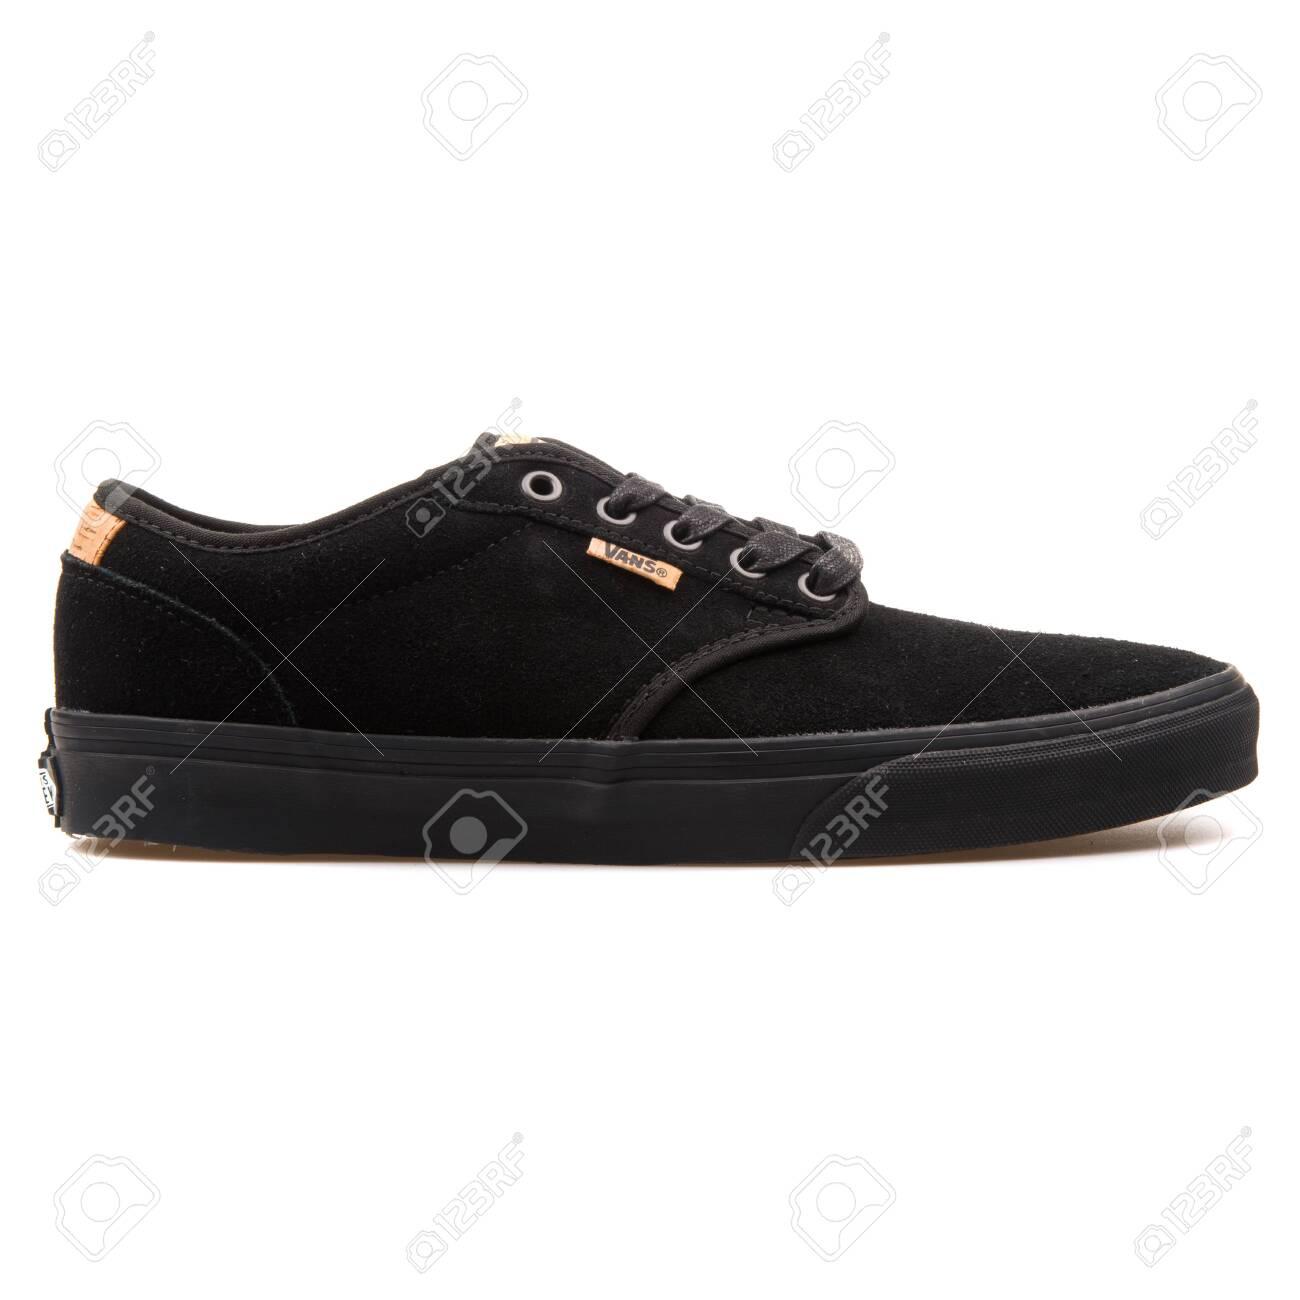 Vans Atwood Suede Black Sneaker.. Stock